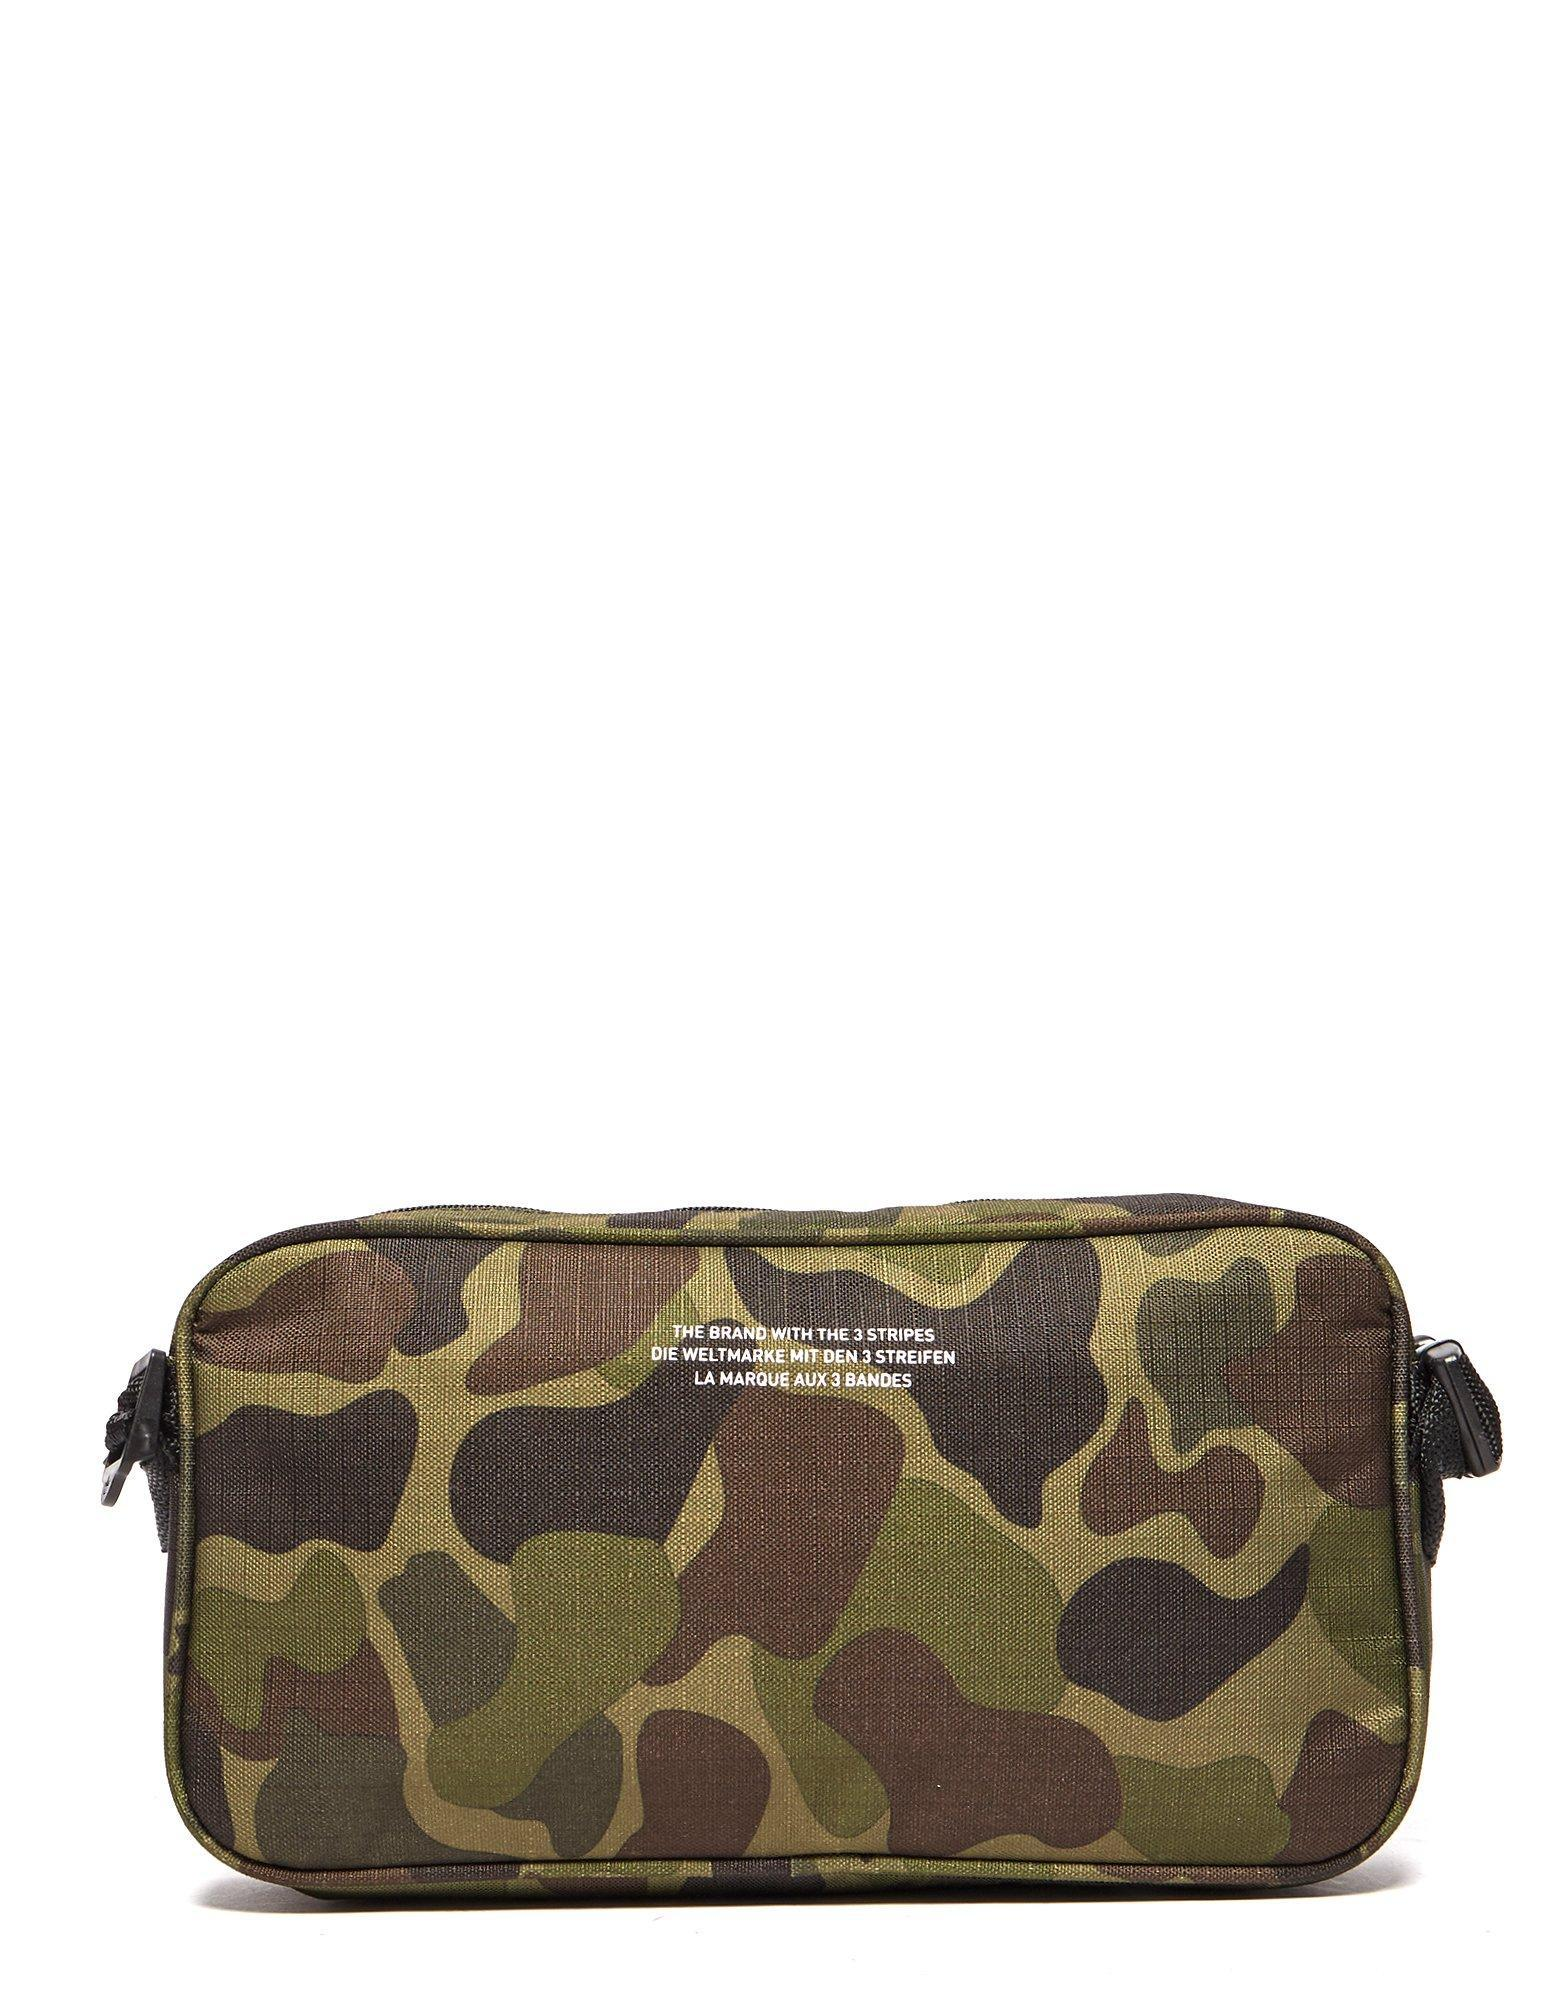 Lyst - adidas Originals Crossbody Bag for Men 8e3731ca19c8c